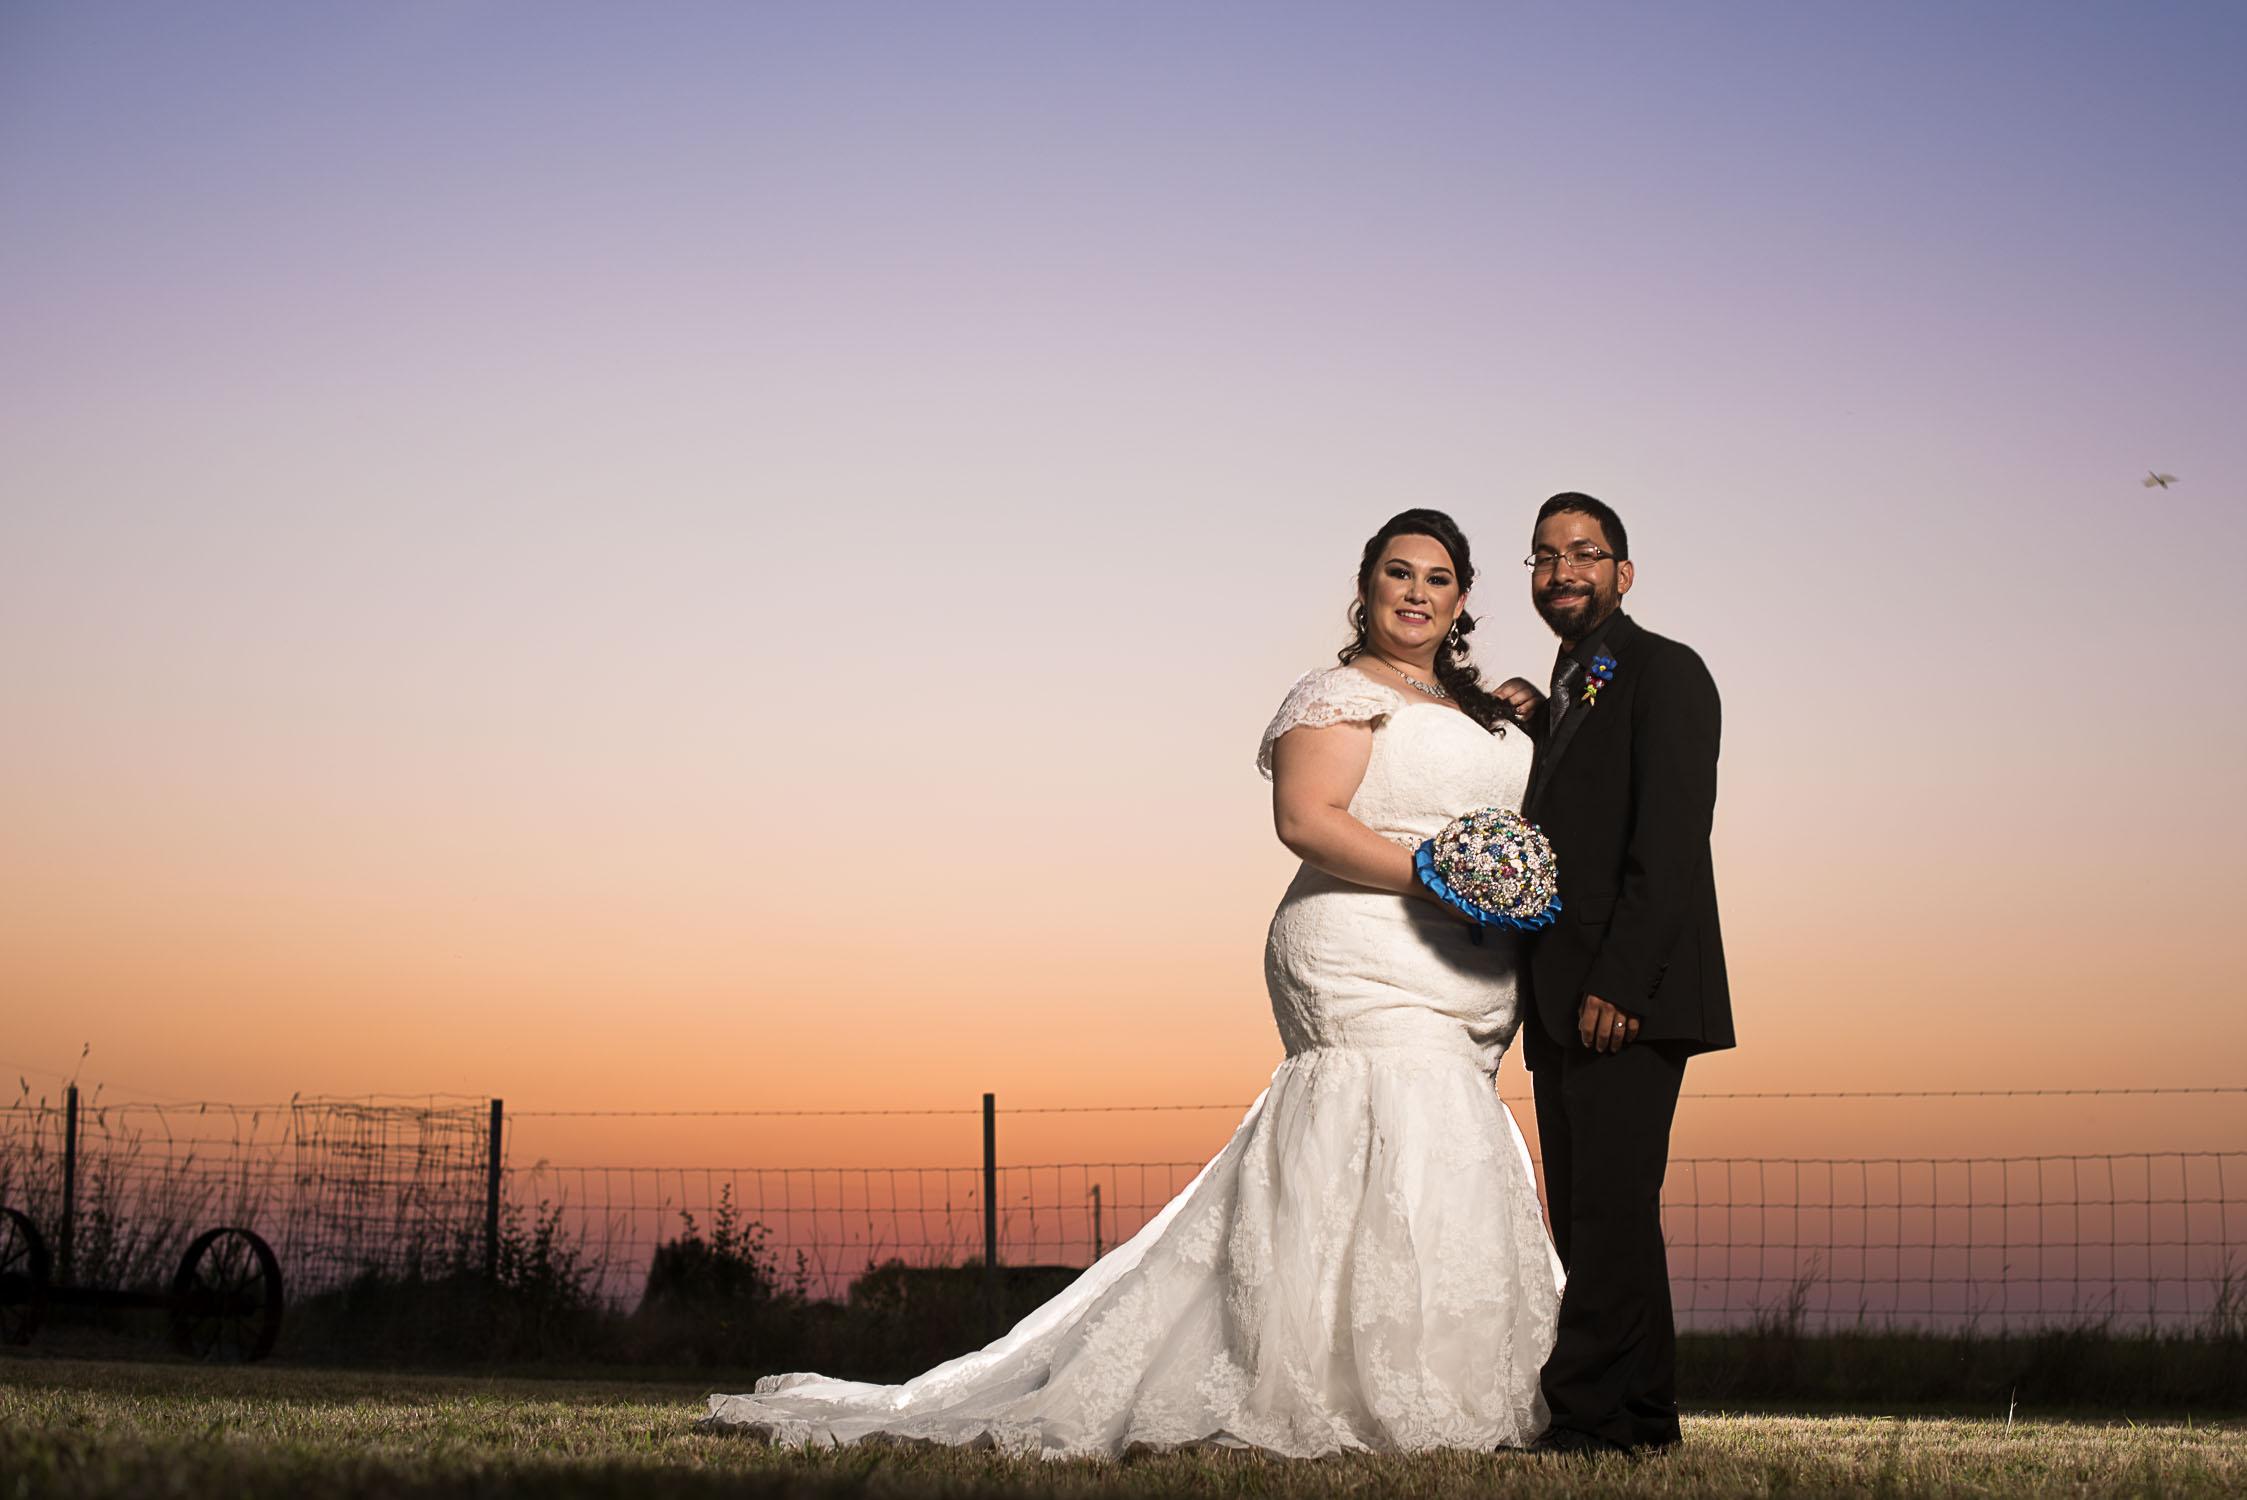 Leal Wedding Mira Visu Photography-145.jpg